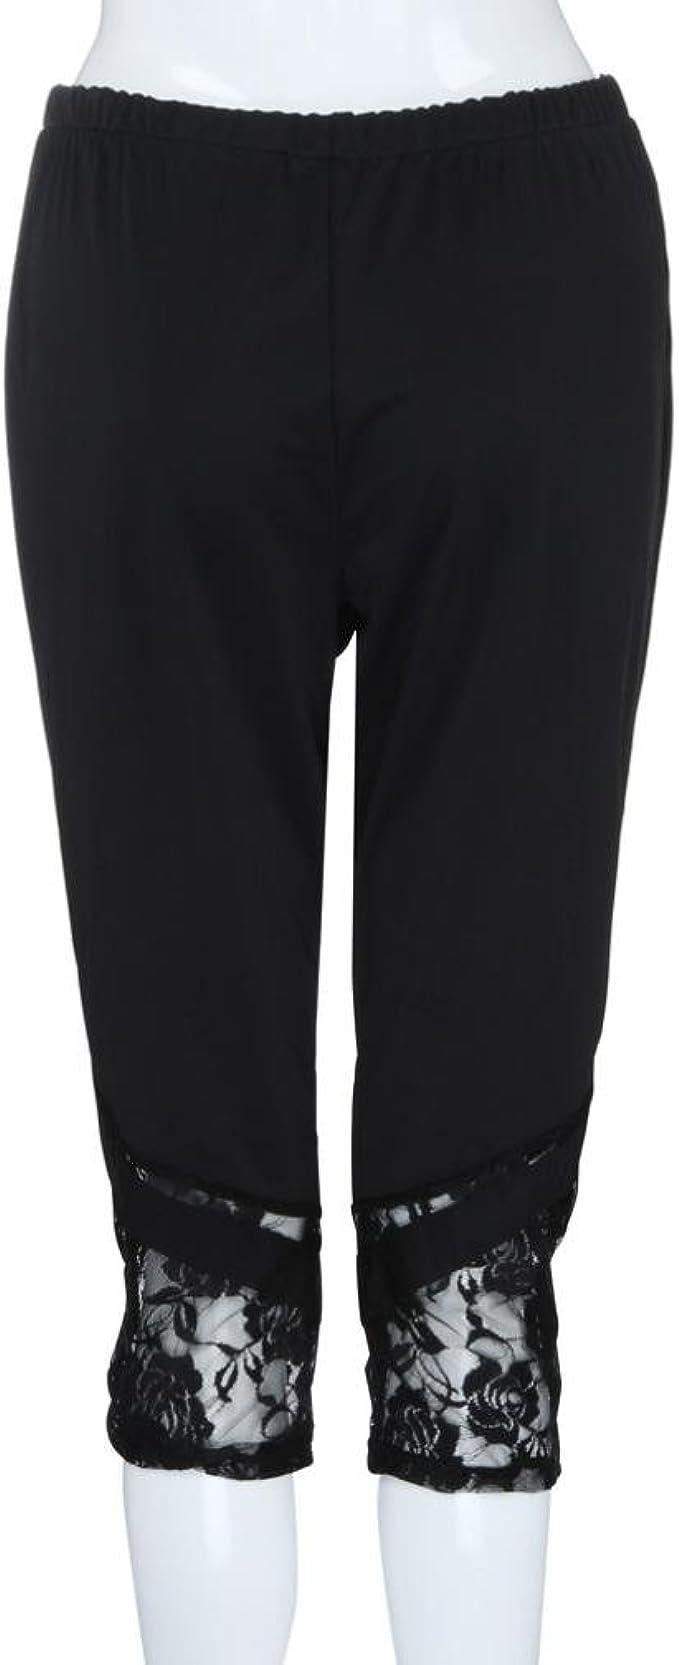 Women High Waist Yoga Shorts Printed Plus Size Cuekondy Stretchy Lace Splicing Workout Sports Pants Leggings Hot Sale